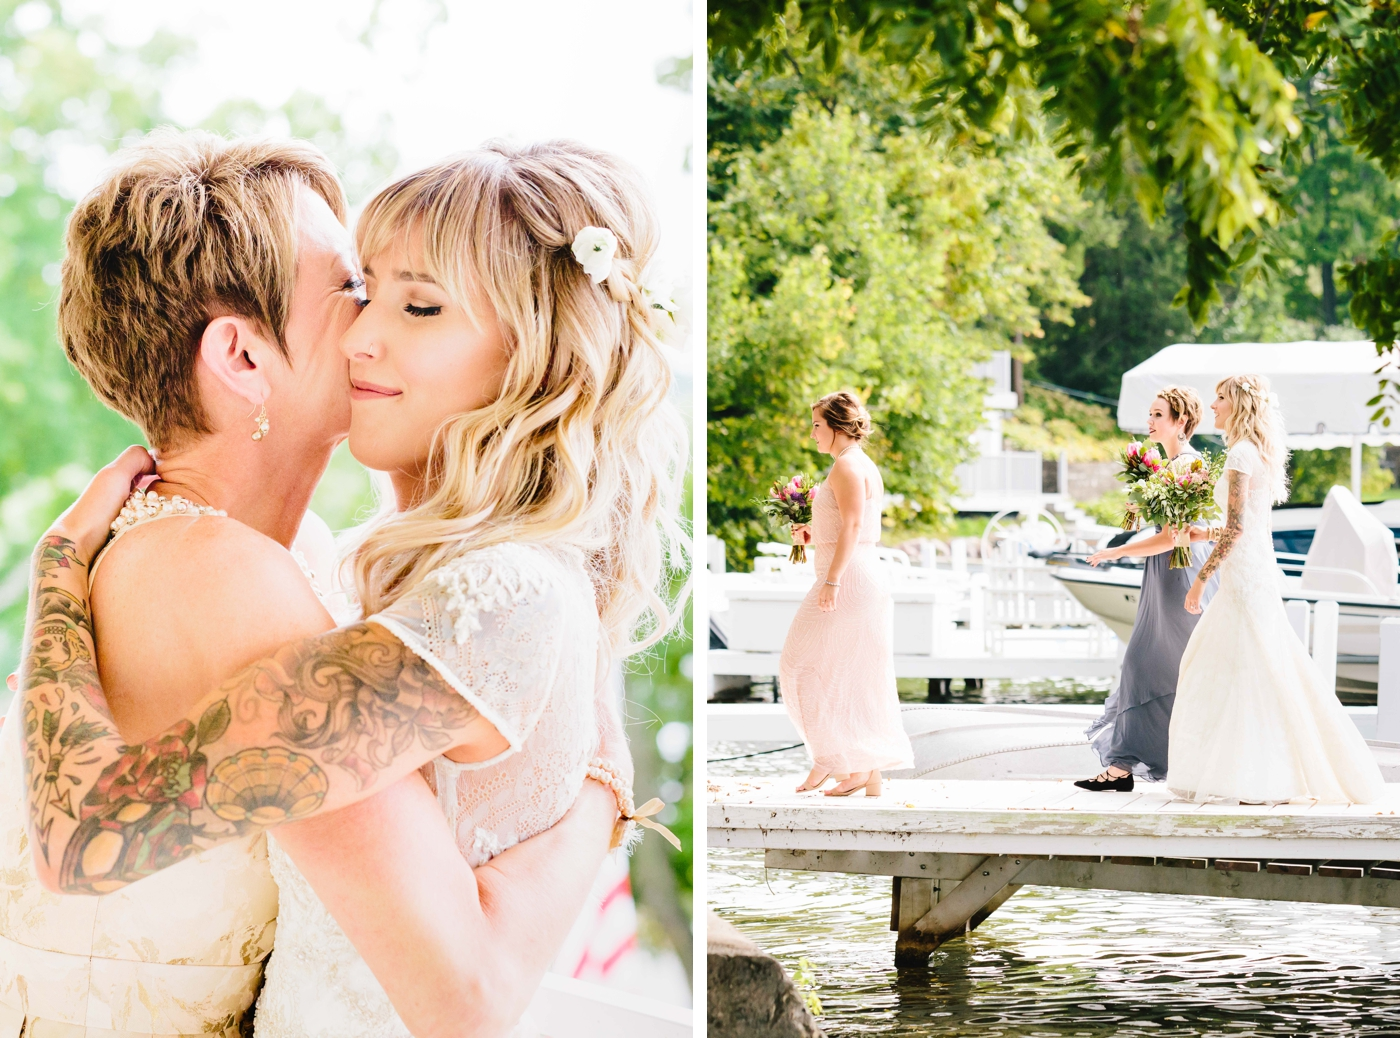 chicago-fine-art-wedding-photography-chriskelsey6